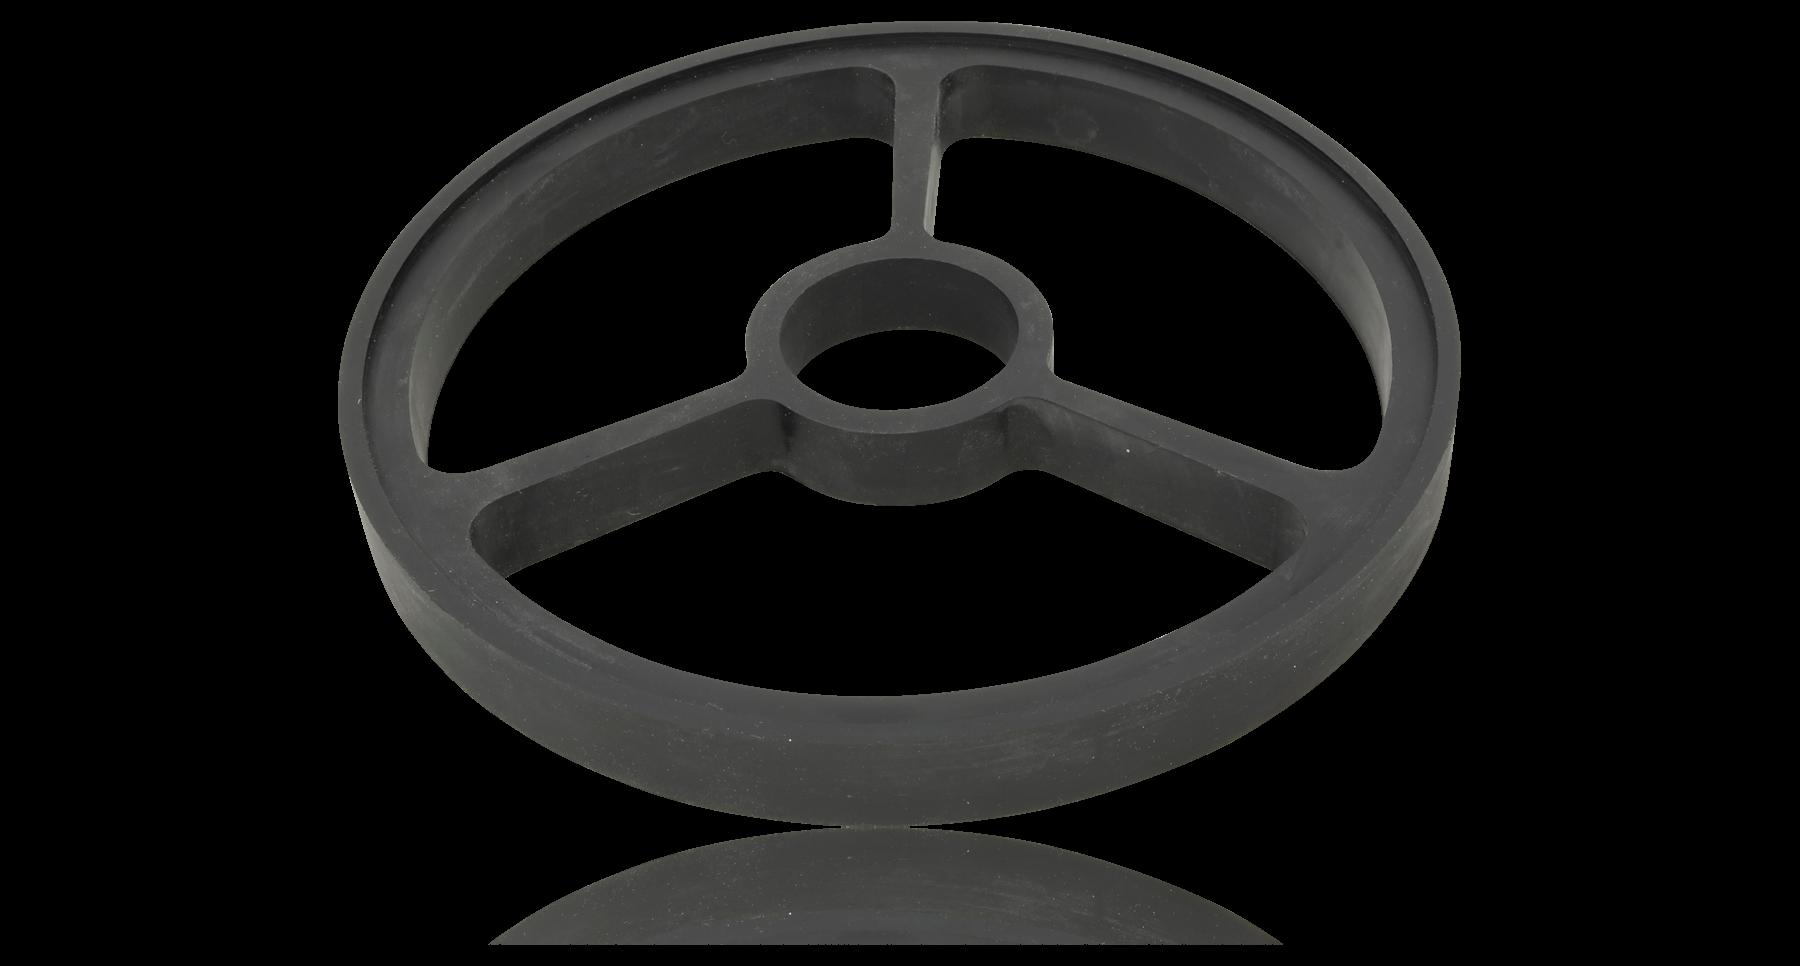 Фото 2 - Подставка для камней (QA-0060, QA-0061, QA-0062) 220*23мм плоский круг, Togi Zyozu